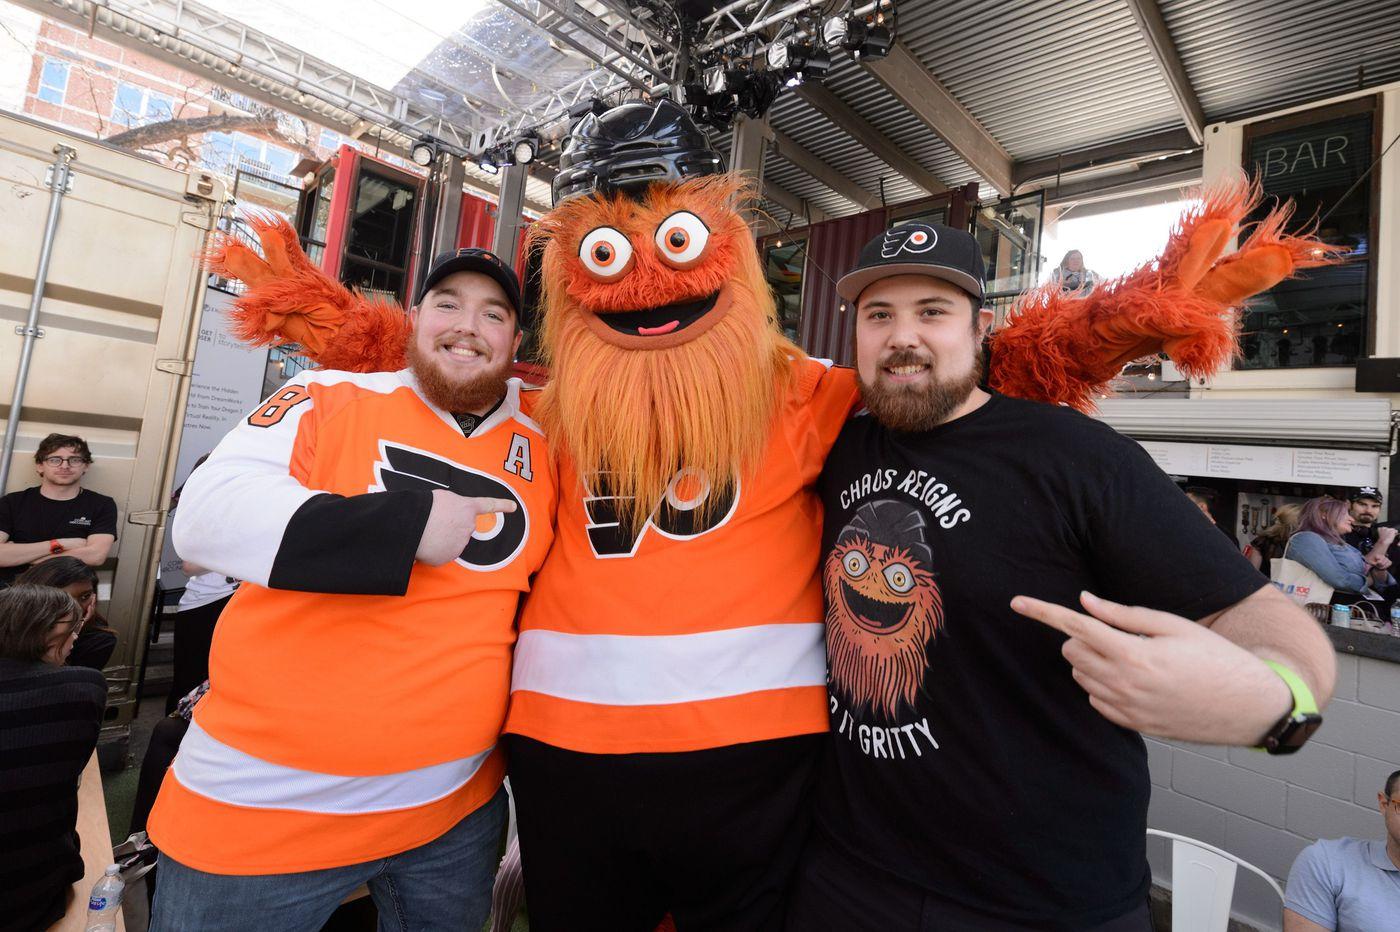 Gritty, Boyz II Men, Questlove bring Philly to SXSW